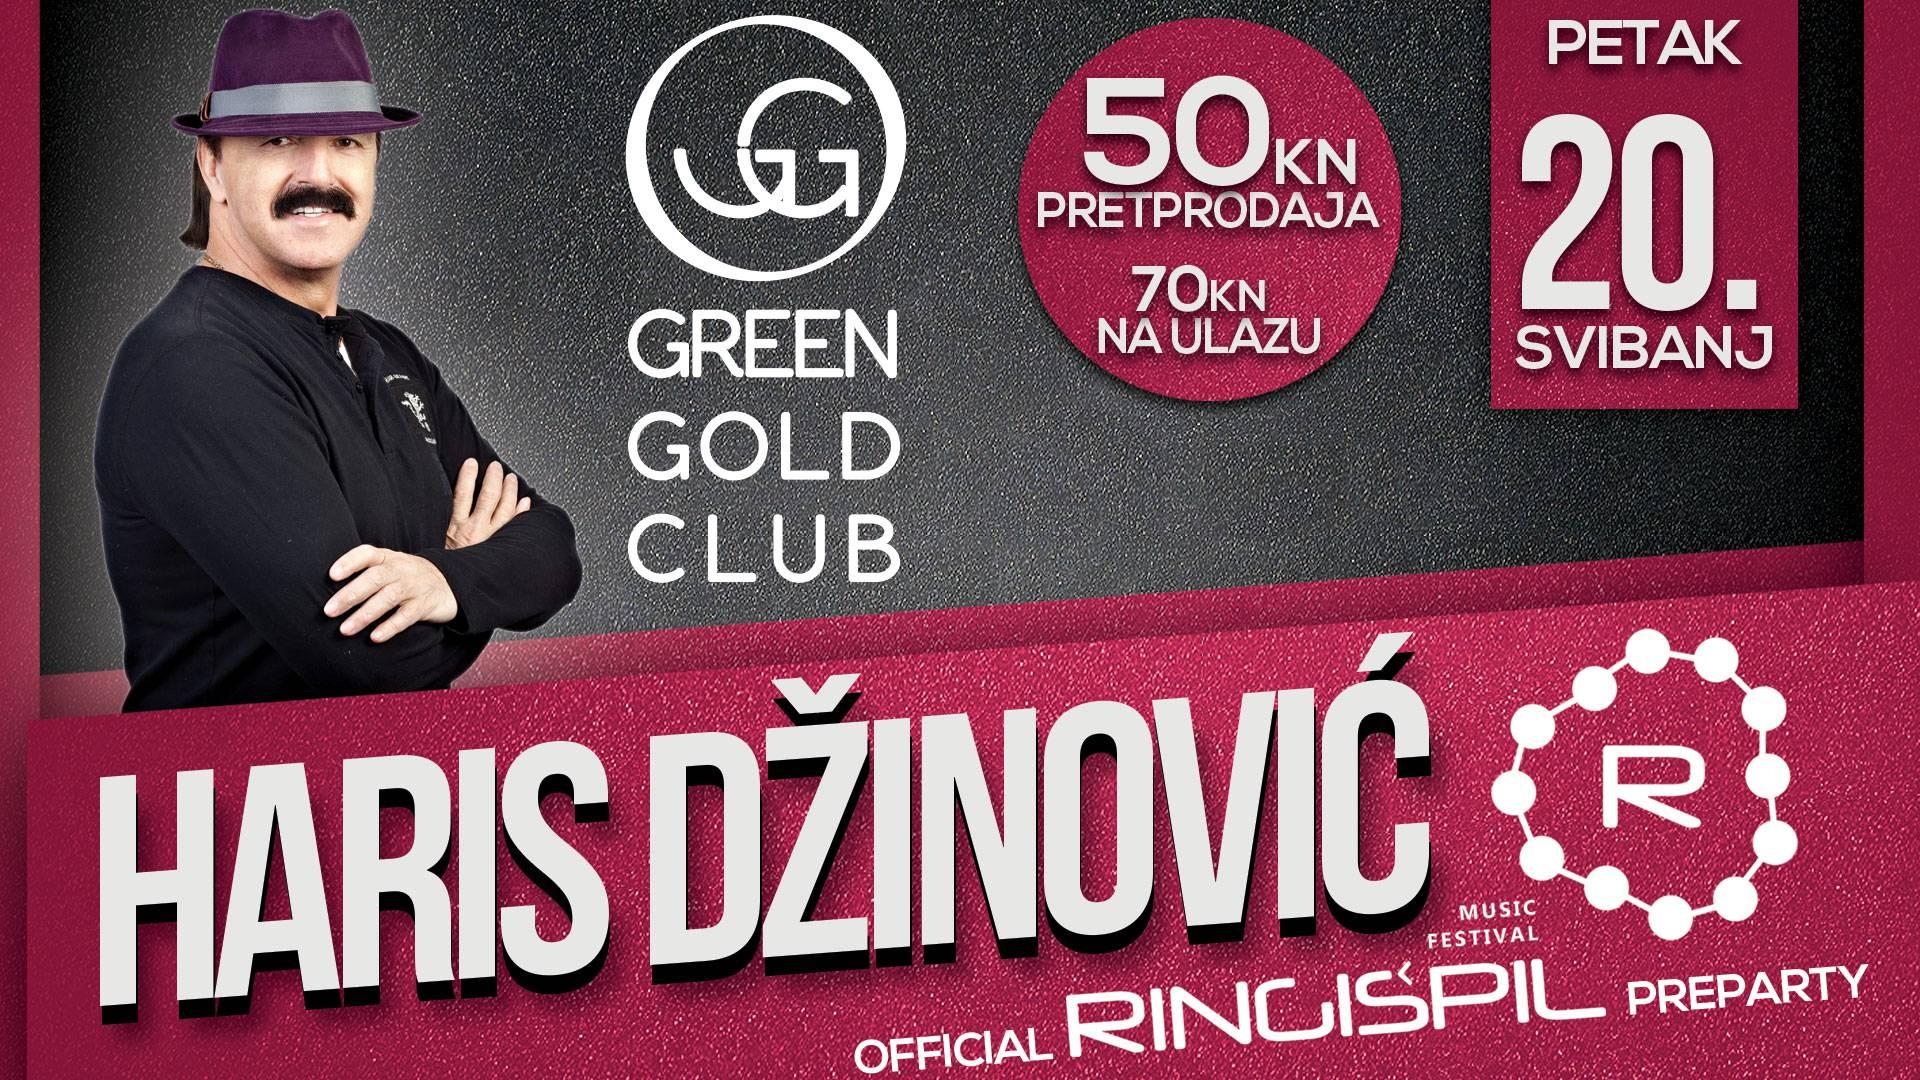 U Green Gold Club stižu Sandi, tamburaši i on, Haris Džinović